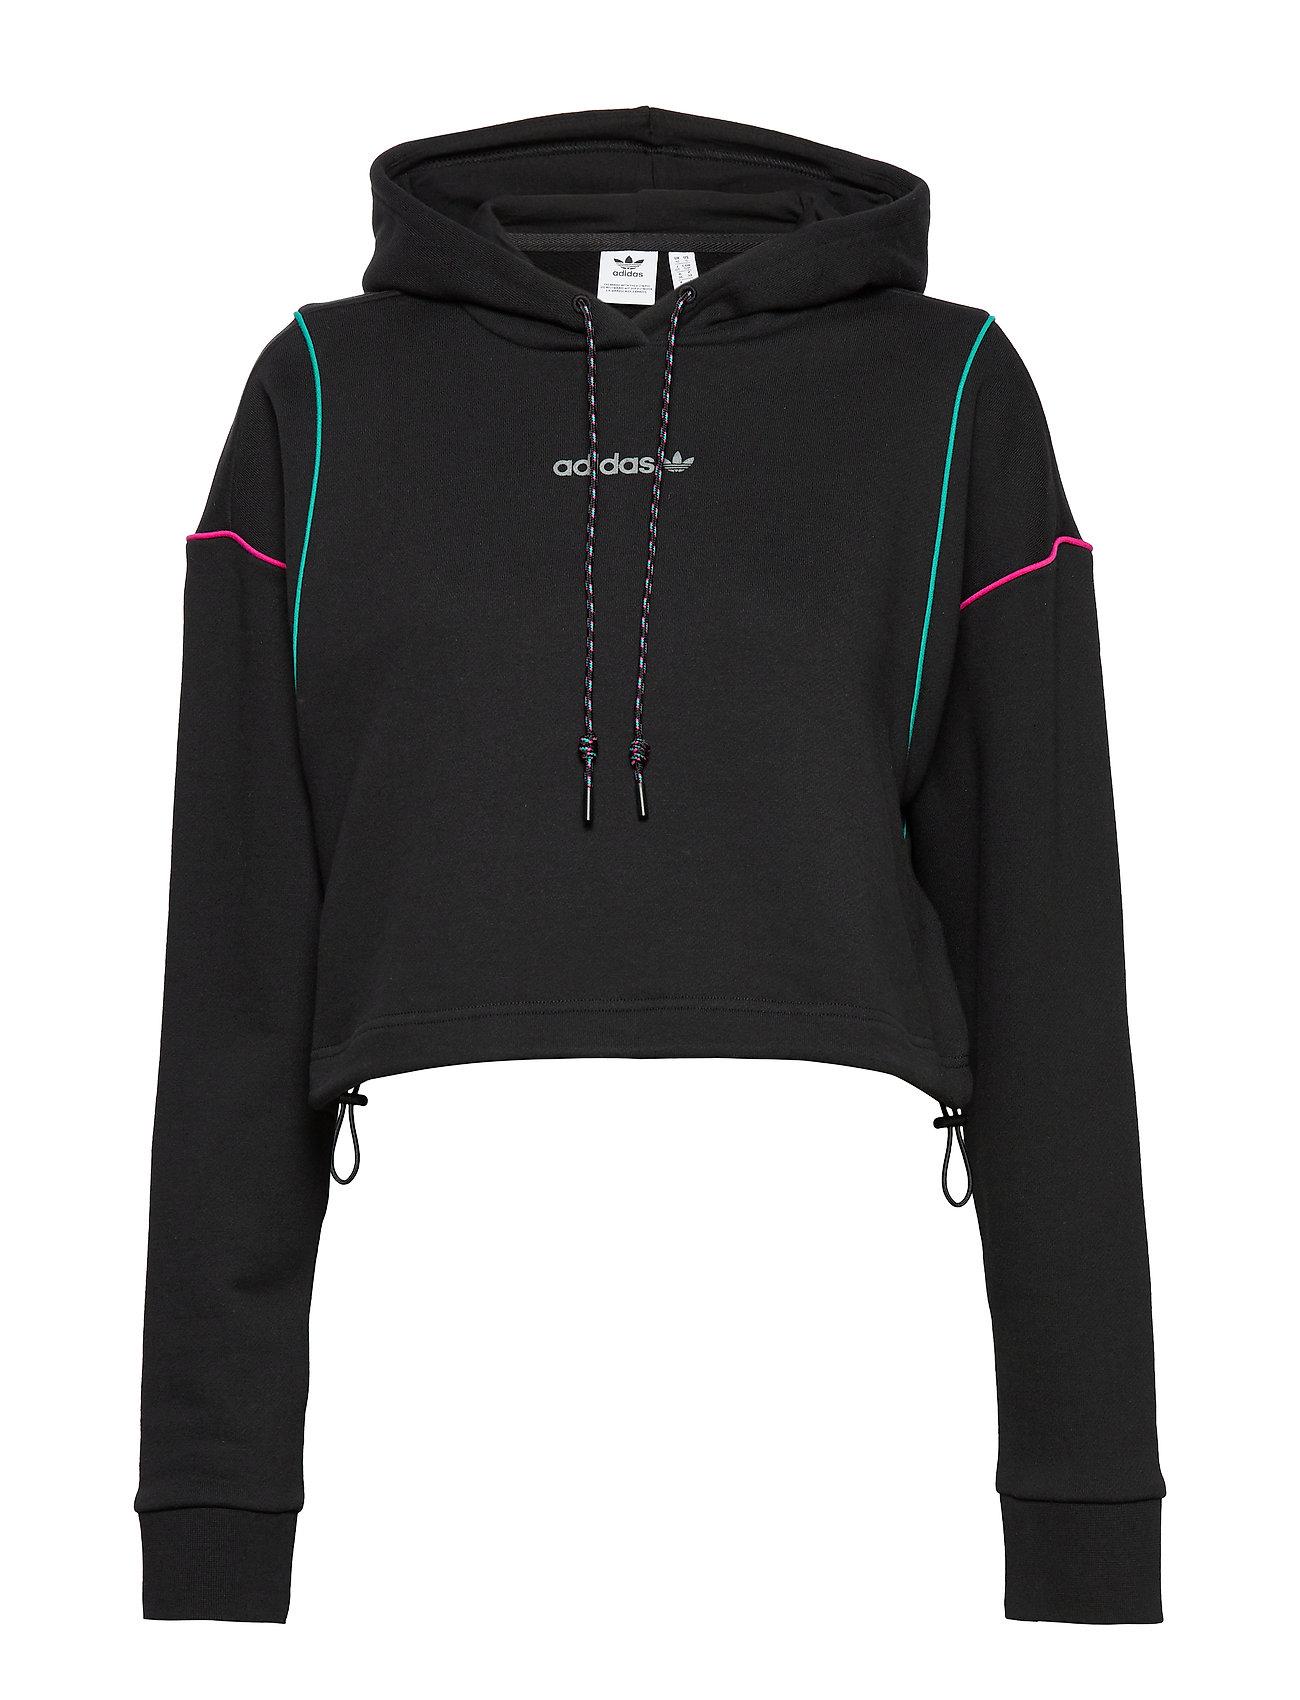 Cropped Hoodie, Adidas Originals